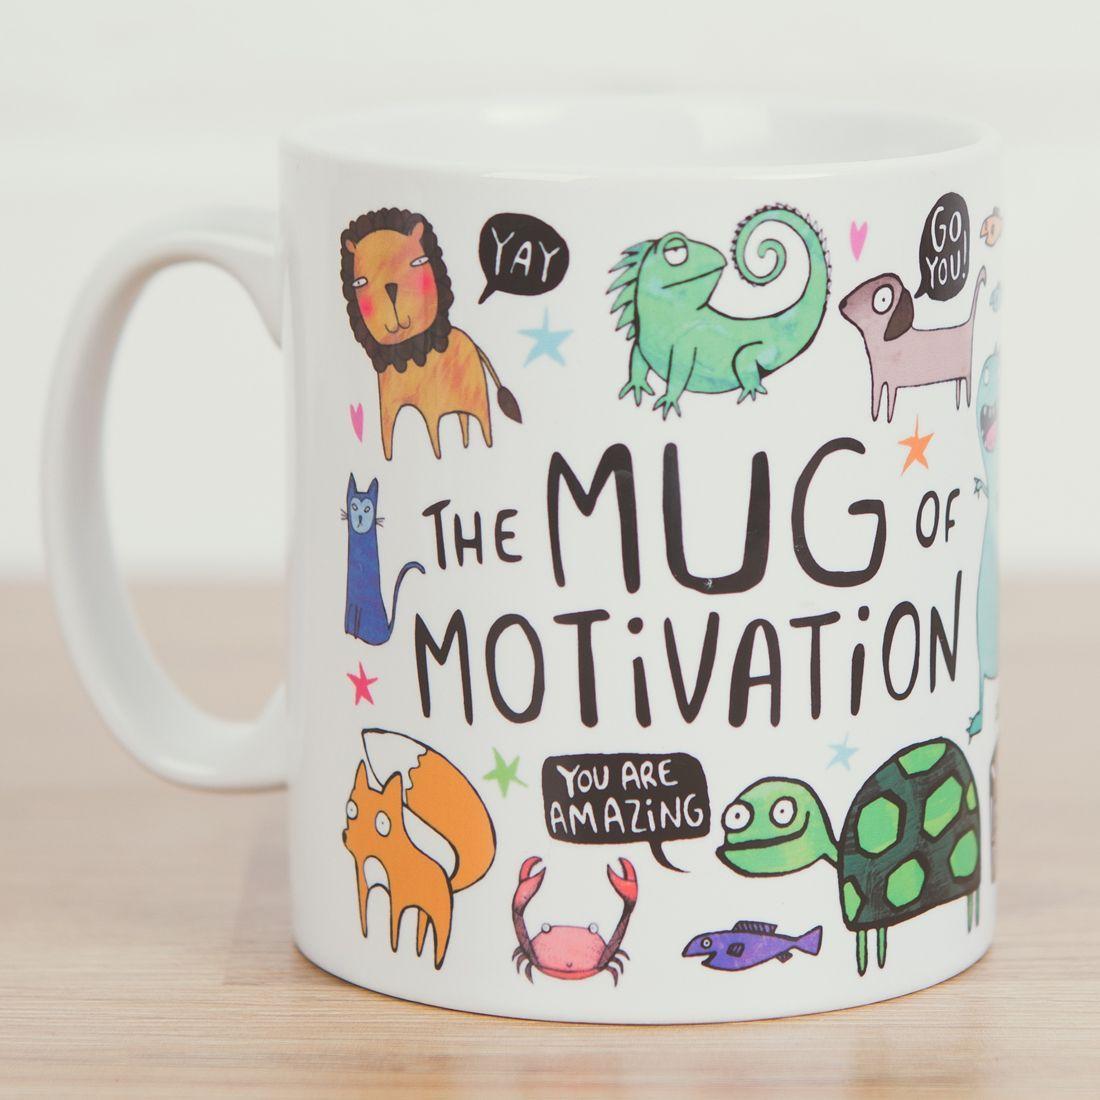 The Illustrated Mug of Motivation